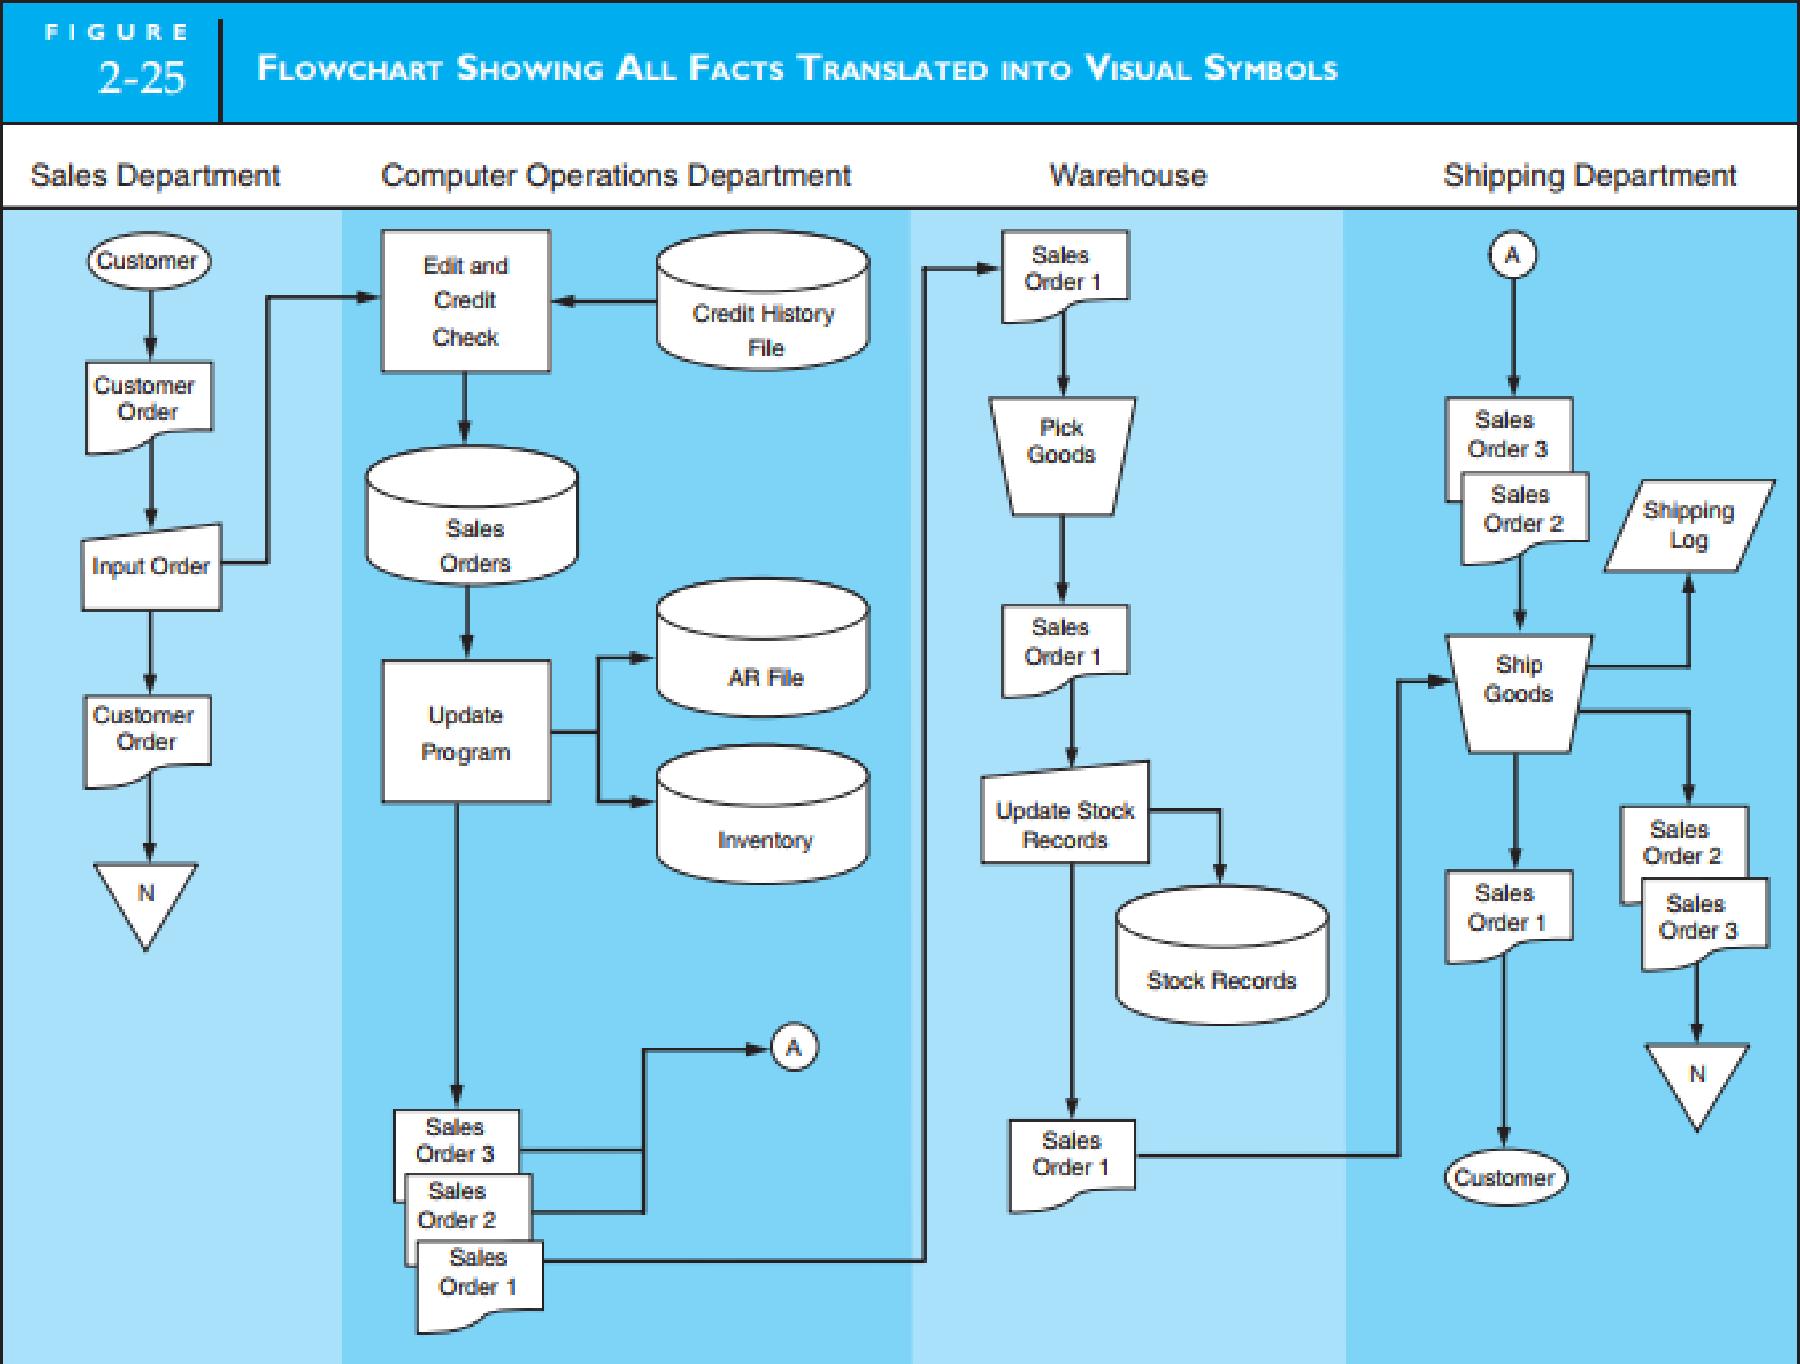 Chapter 2, Problem 15P, SYSTEM FLOWCHARTCASHDISBURSEMENTS (AUTOMATEDPROCESSES) Using the flowchart structure presented in